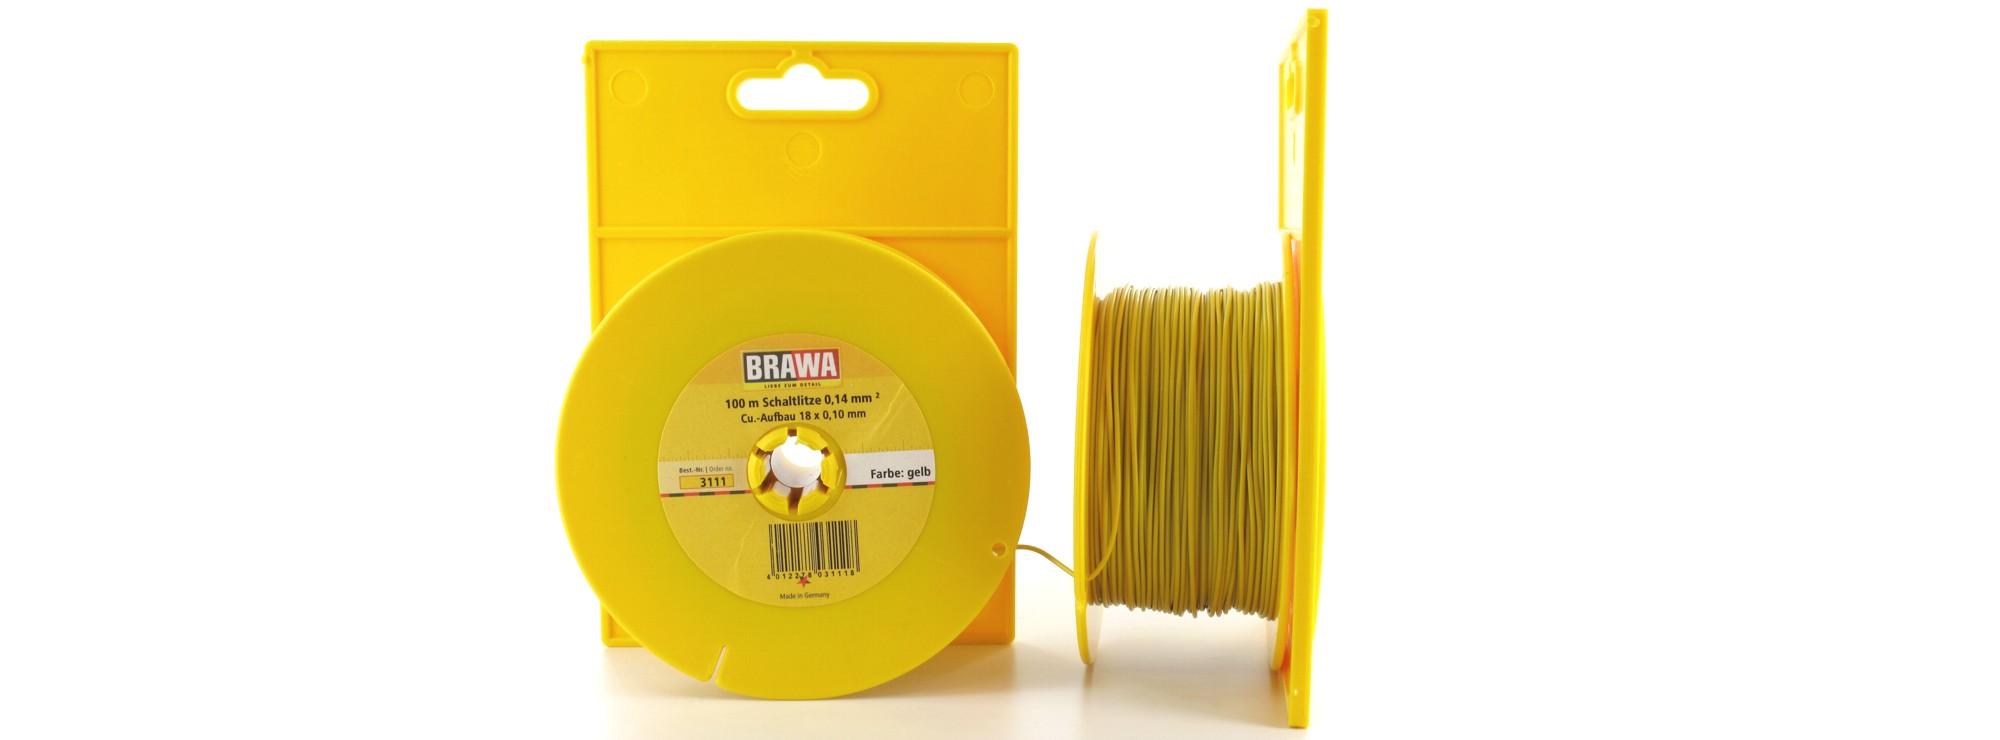 Jobbees Fishman Modem Wiring Diagram Cable Amarillo 014mm De 100 M